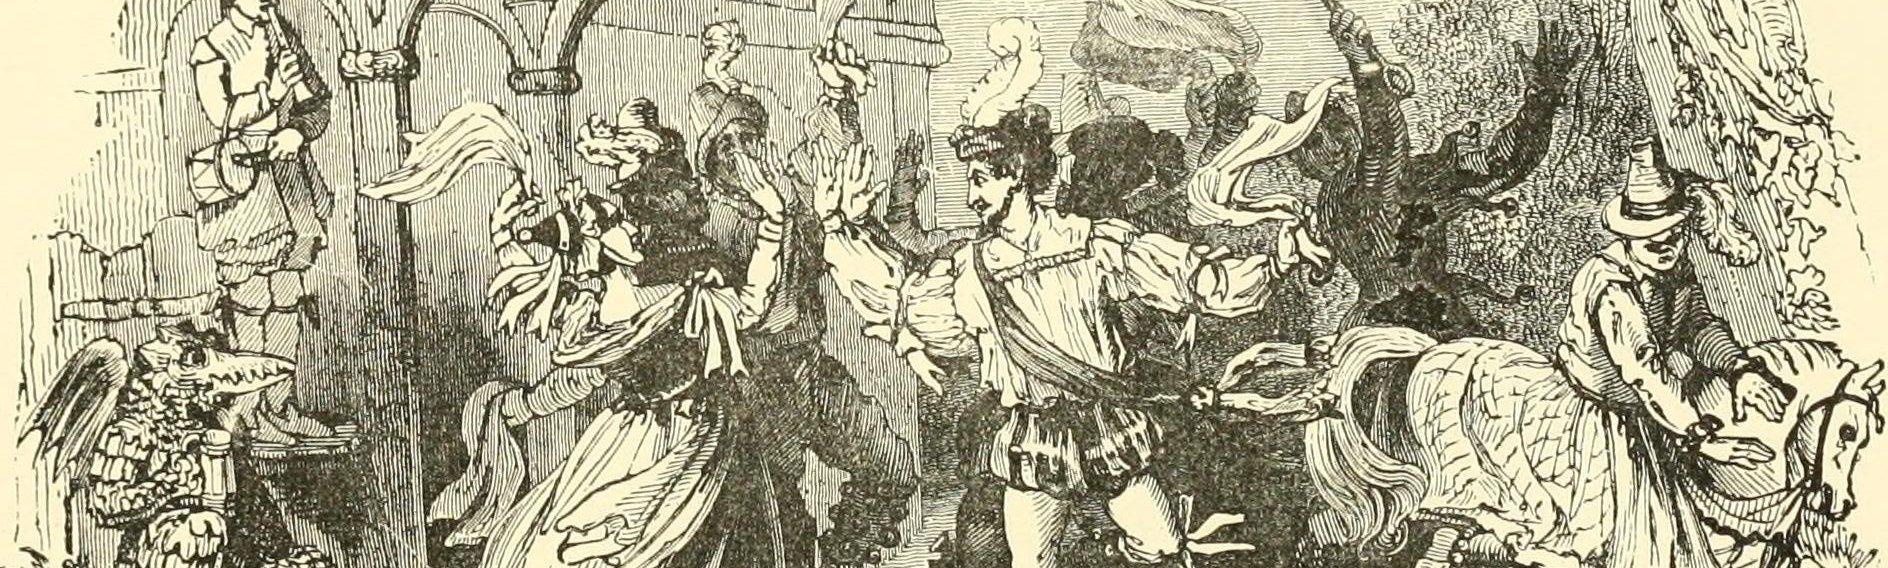 Illustration of a Whitsun Morris Dance, circa 1891.